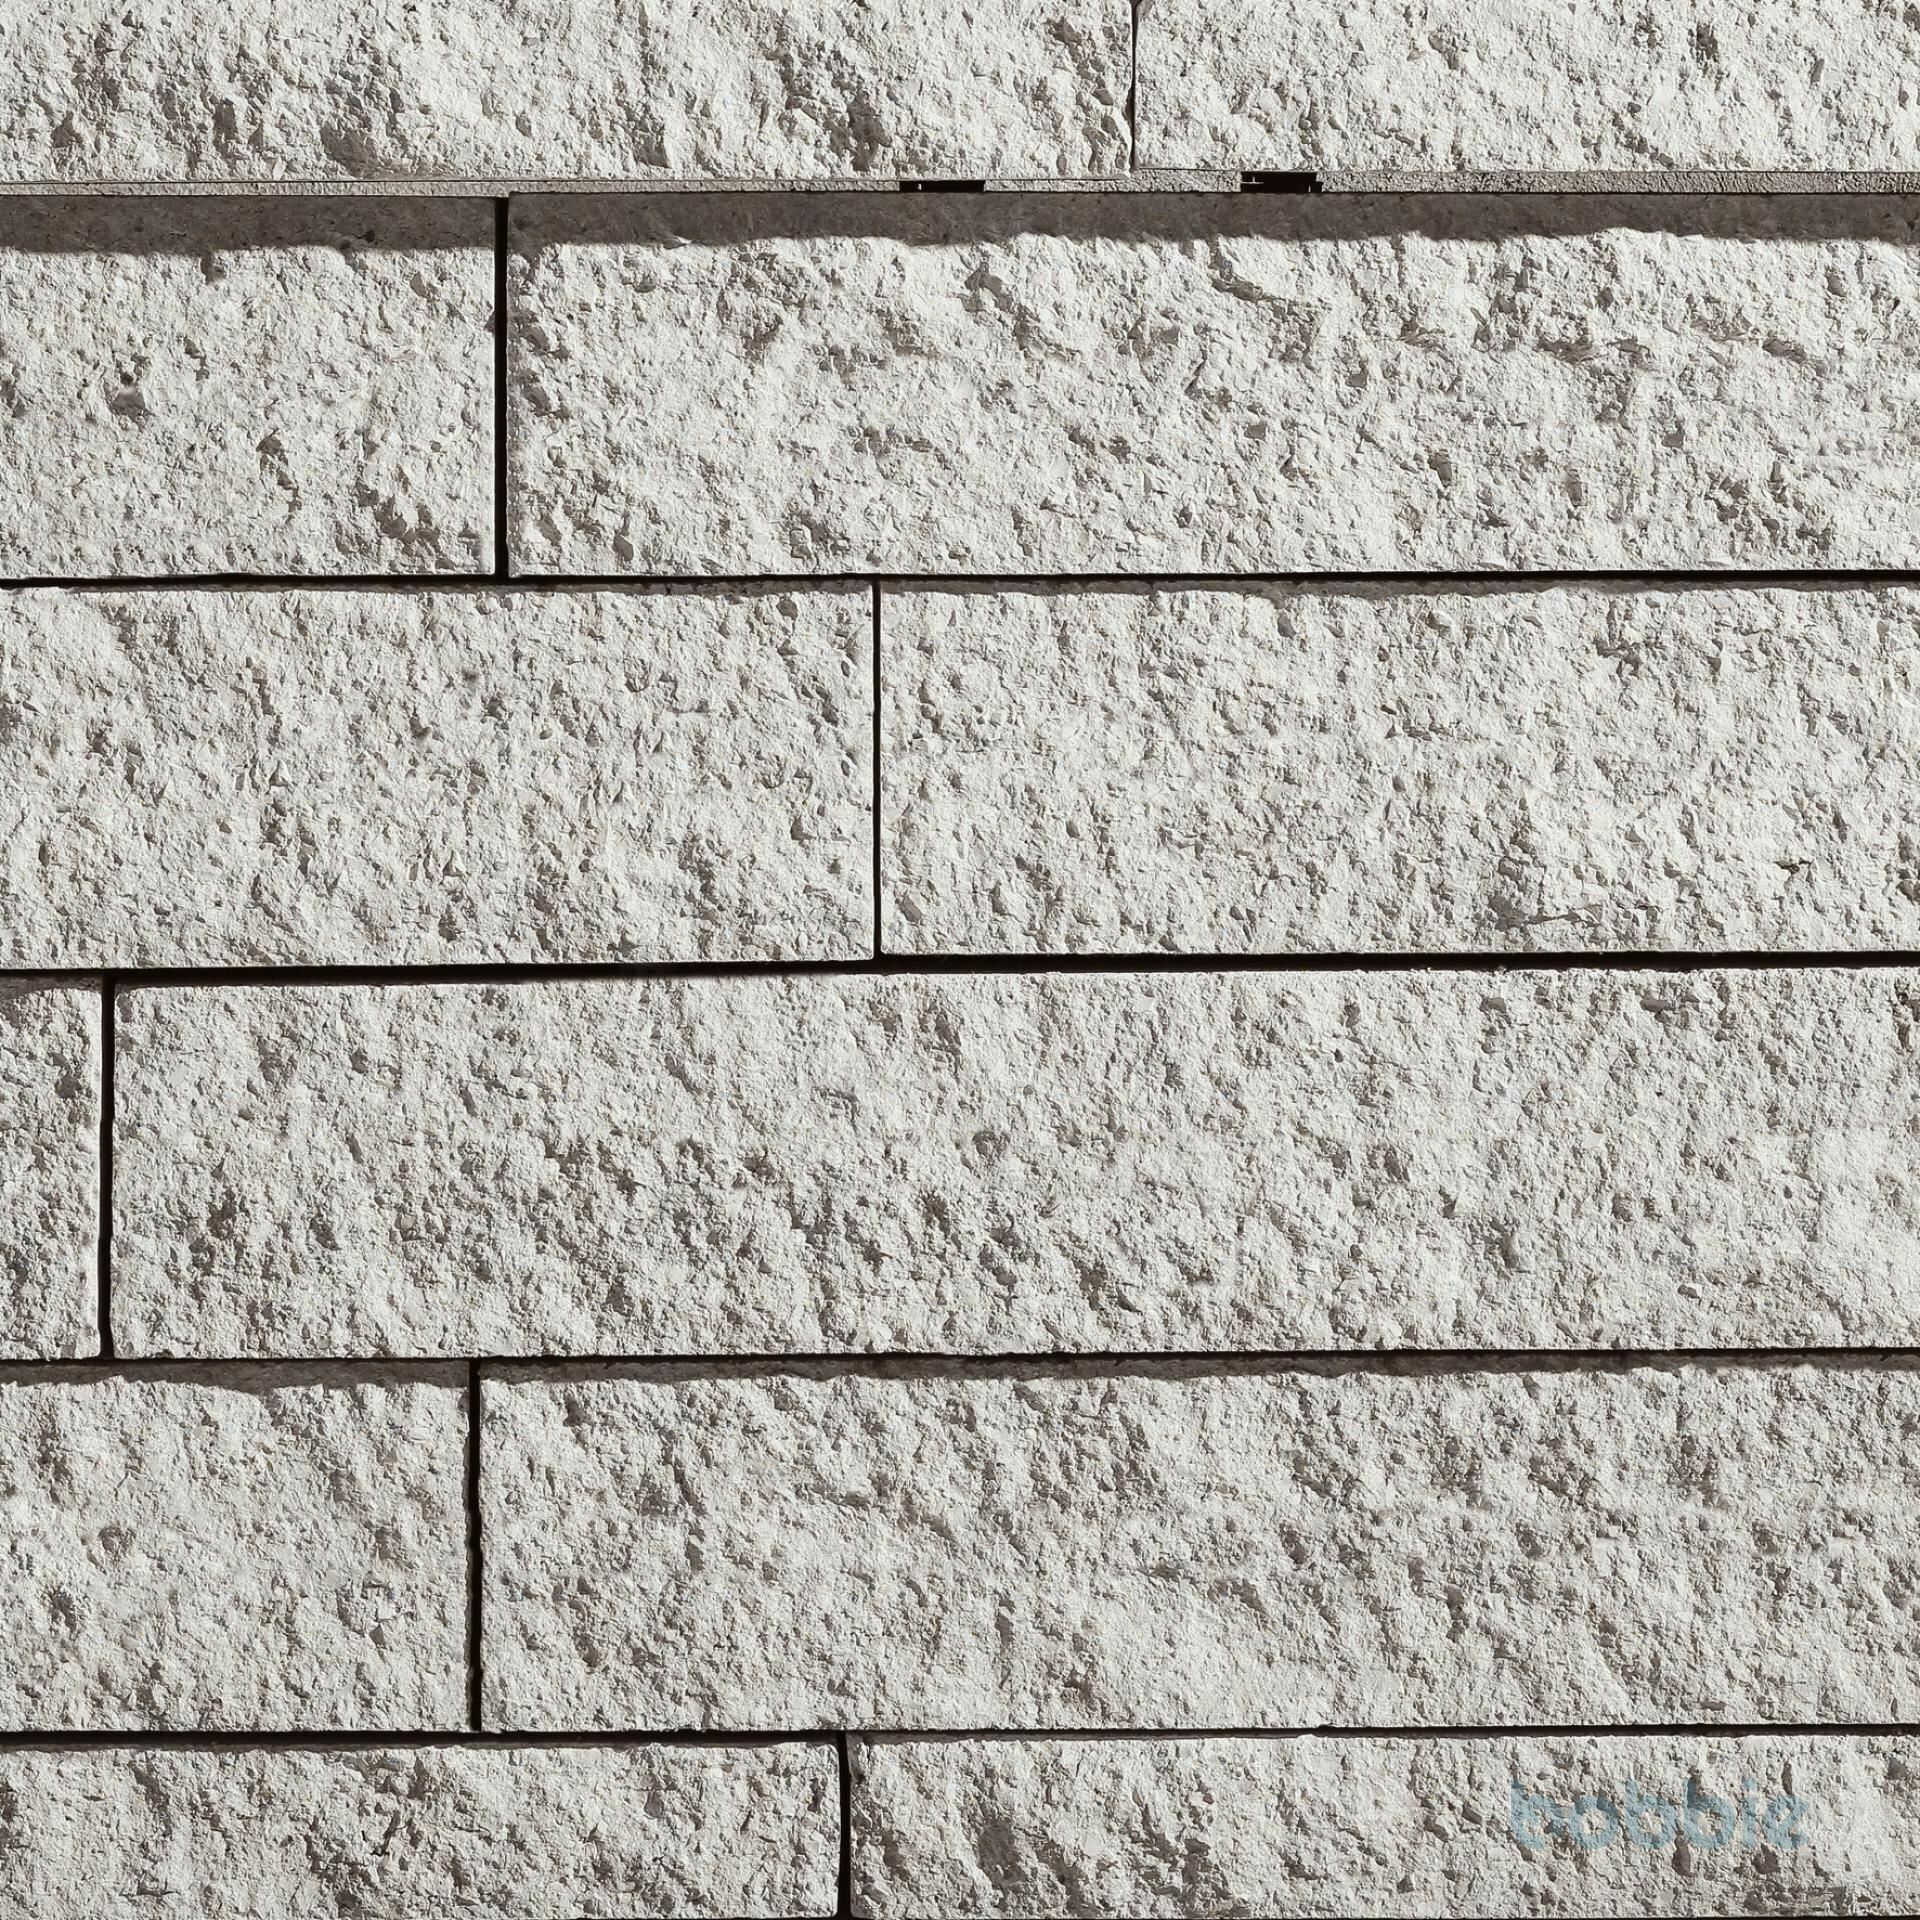 Mauern, CULT® GRANDE ENDABDECKSTEINE, 400/800x225x150, Platingrau